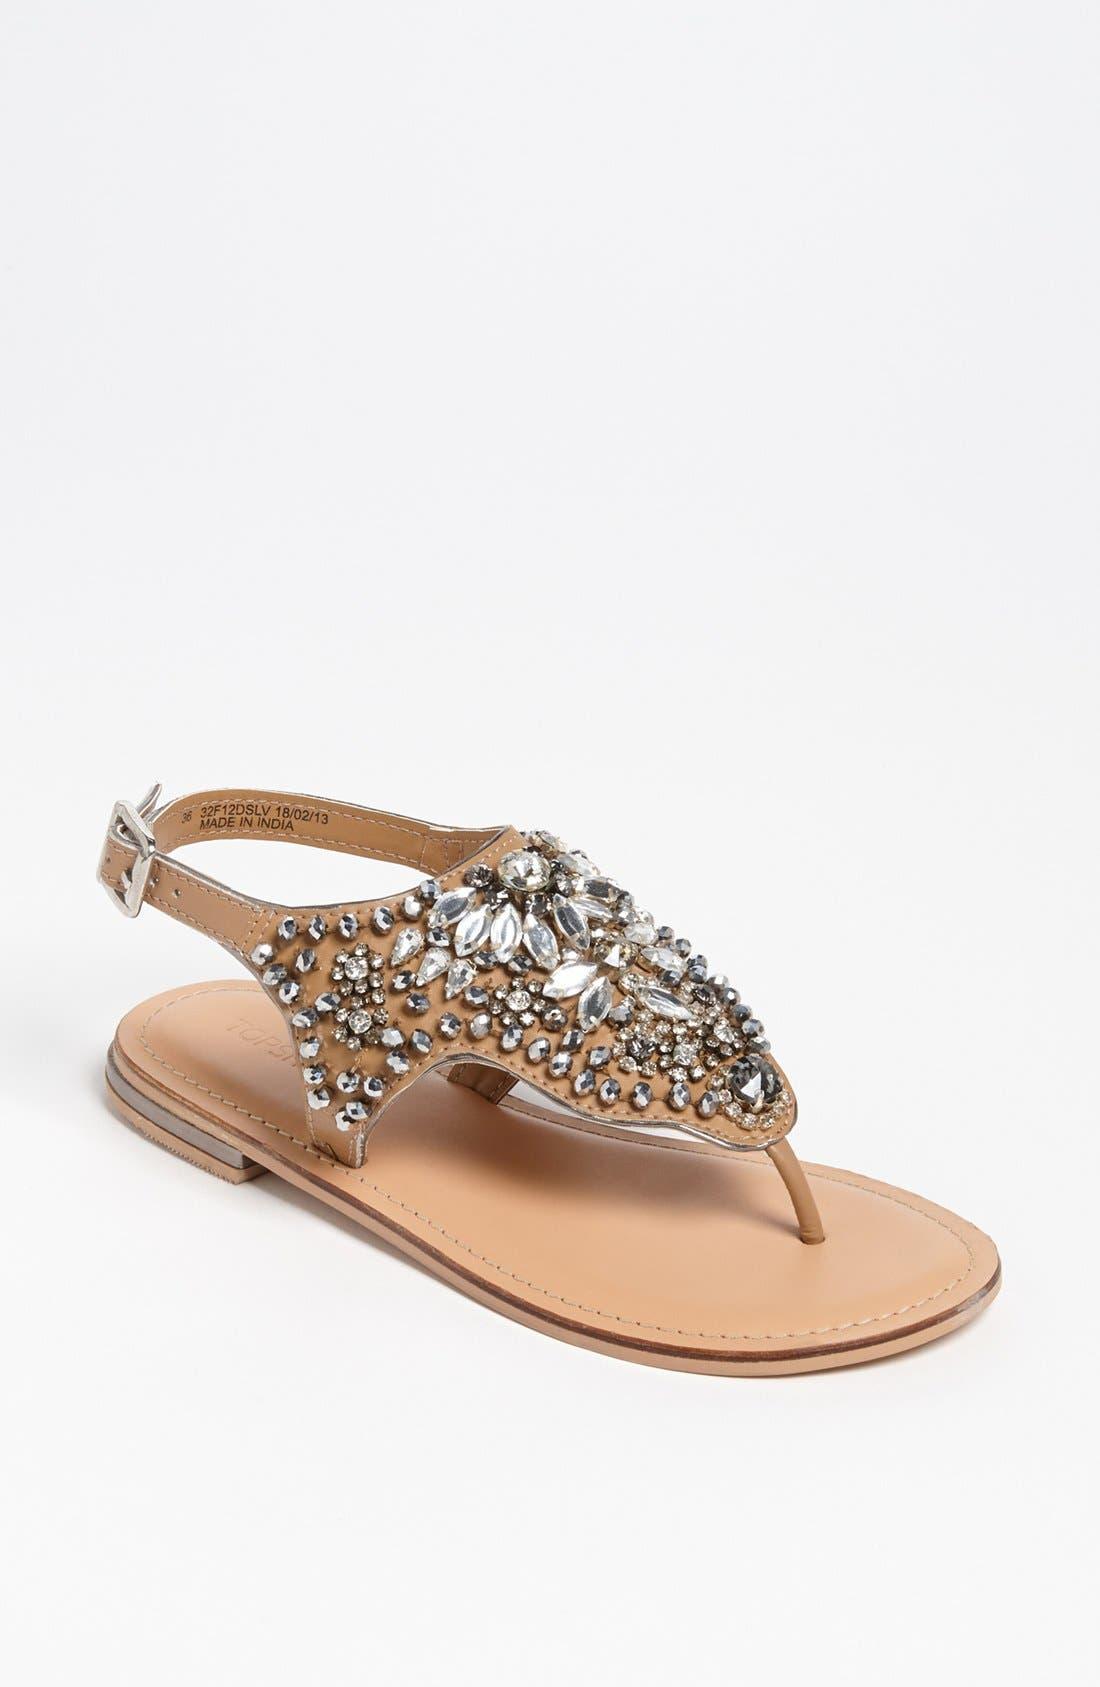 Main Image - Topshop 'Fliss' Sandal